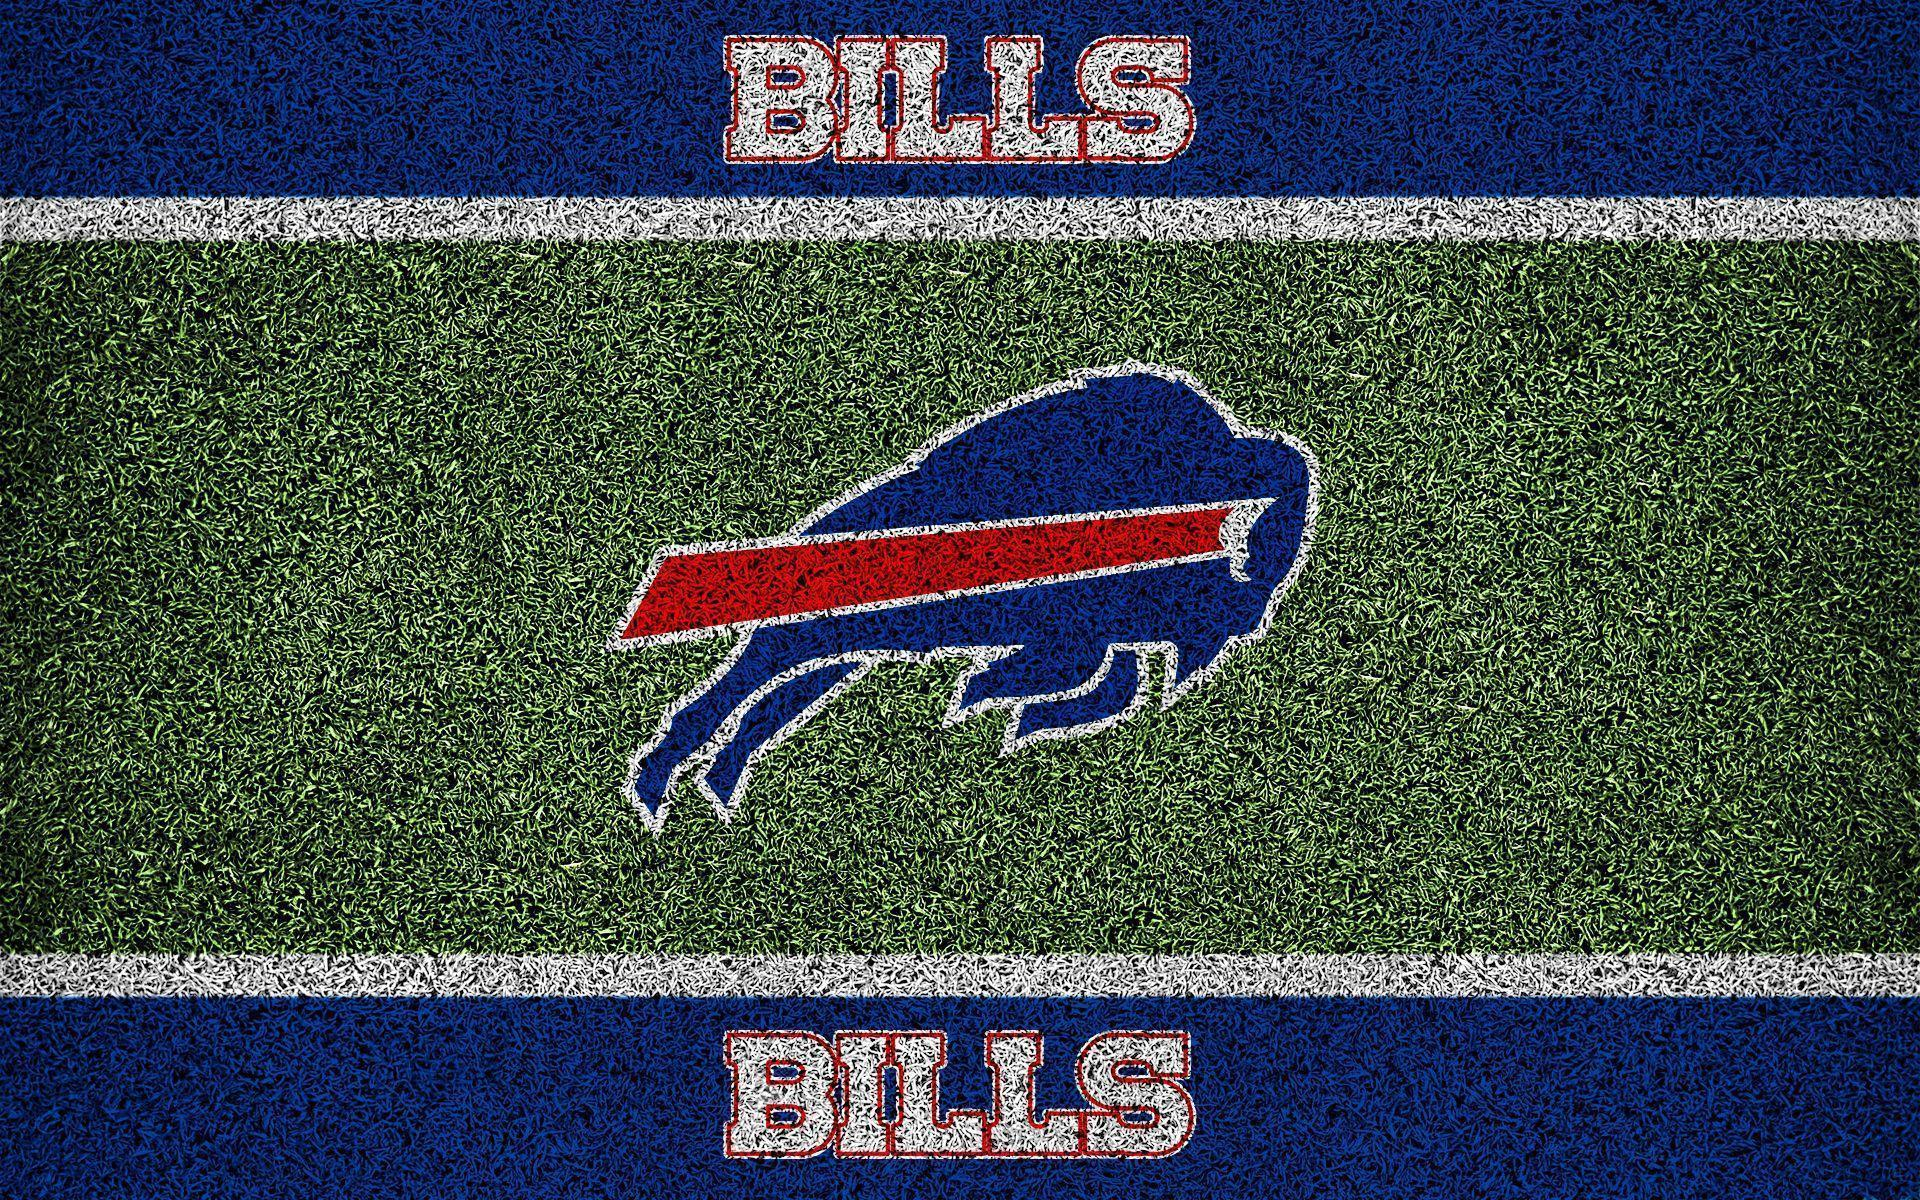 Buffalo Bills Wallpapers - Wallpaper Cave